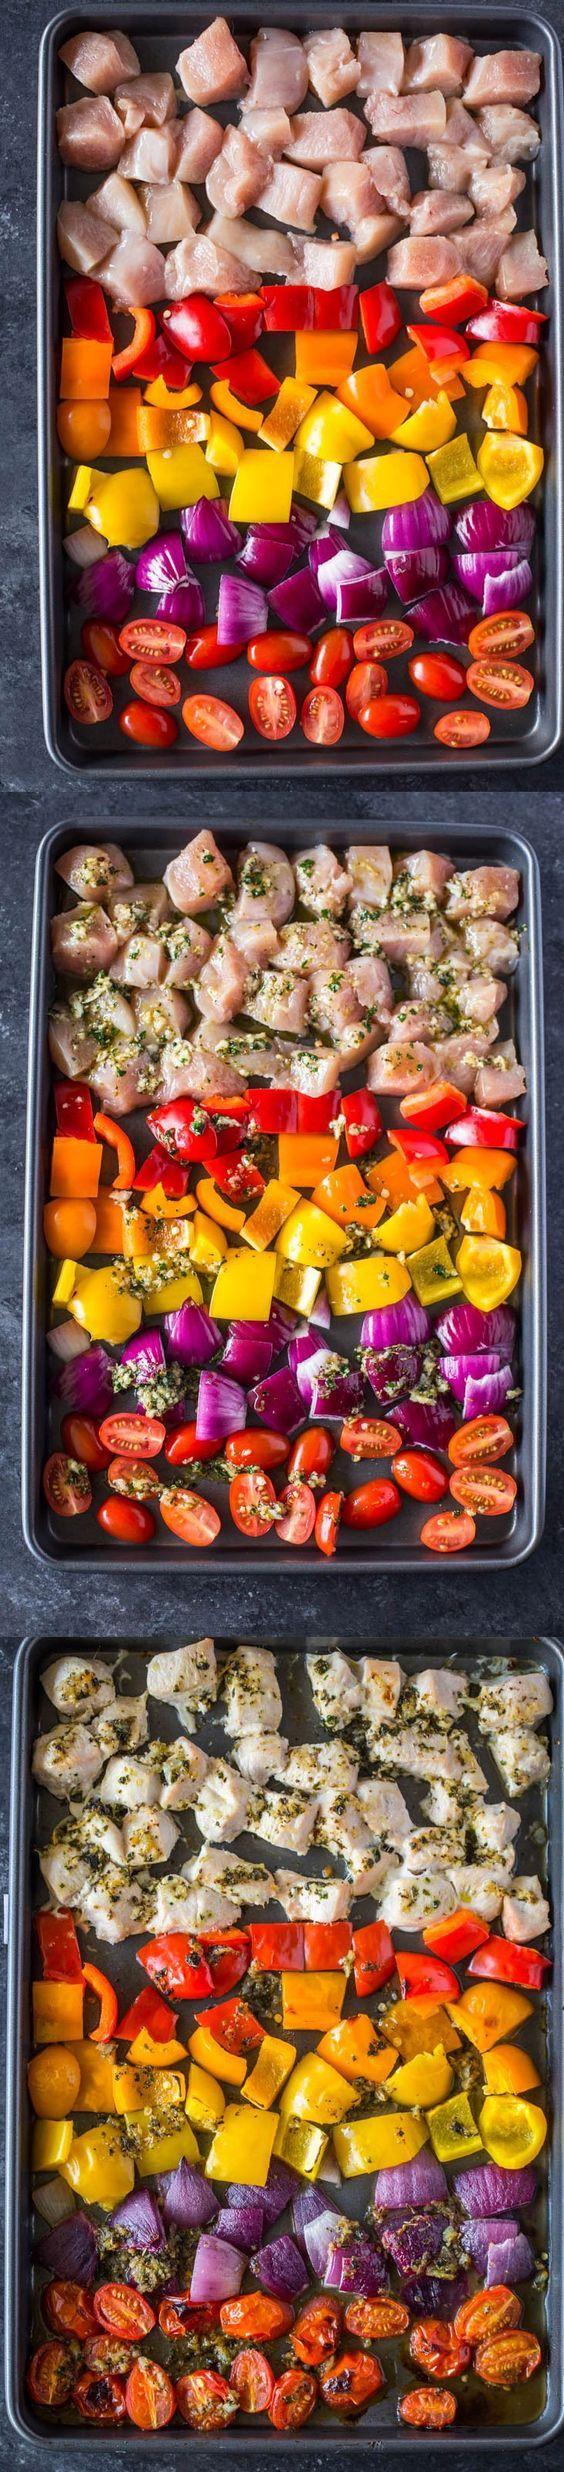 Sheet Pan Greek Chicken & Veggies + Pita Pockets | Gimme Delicious